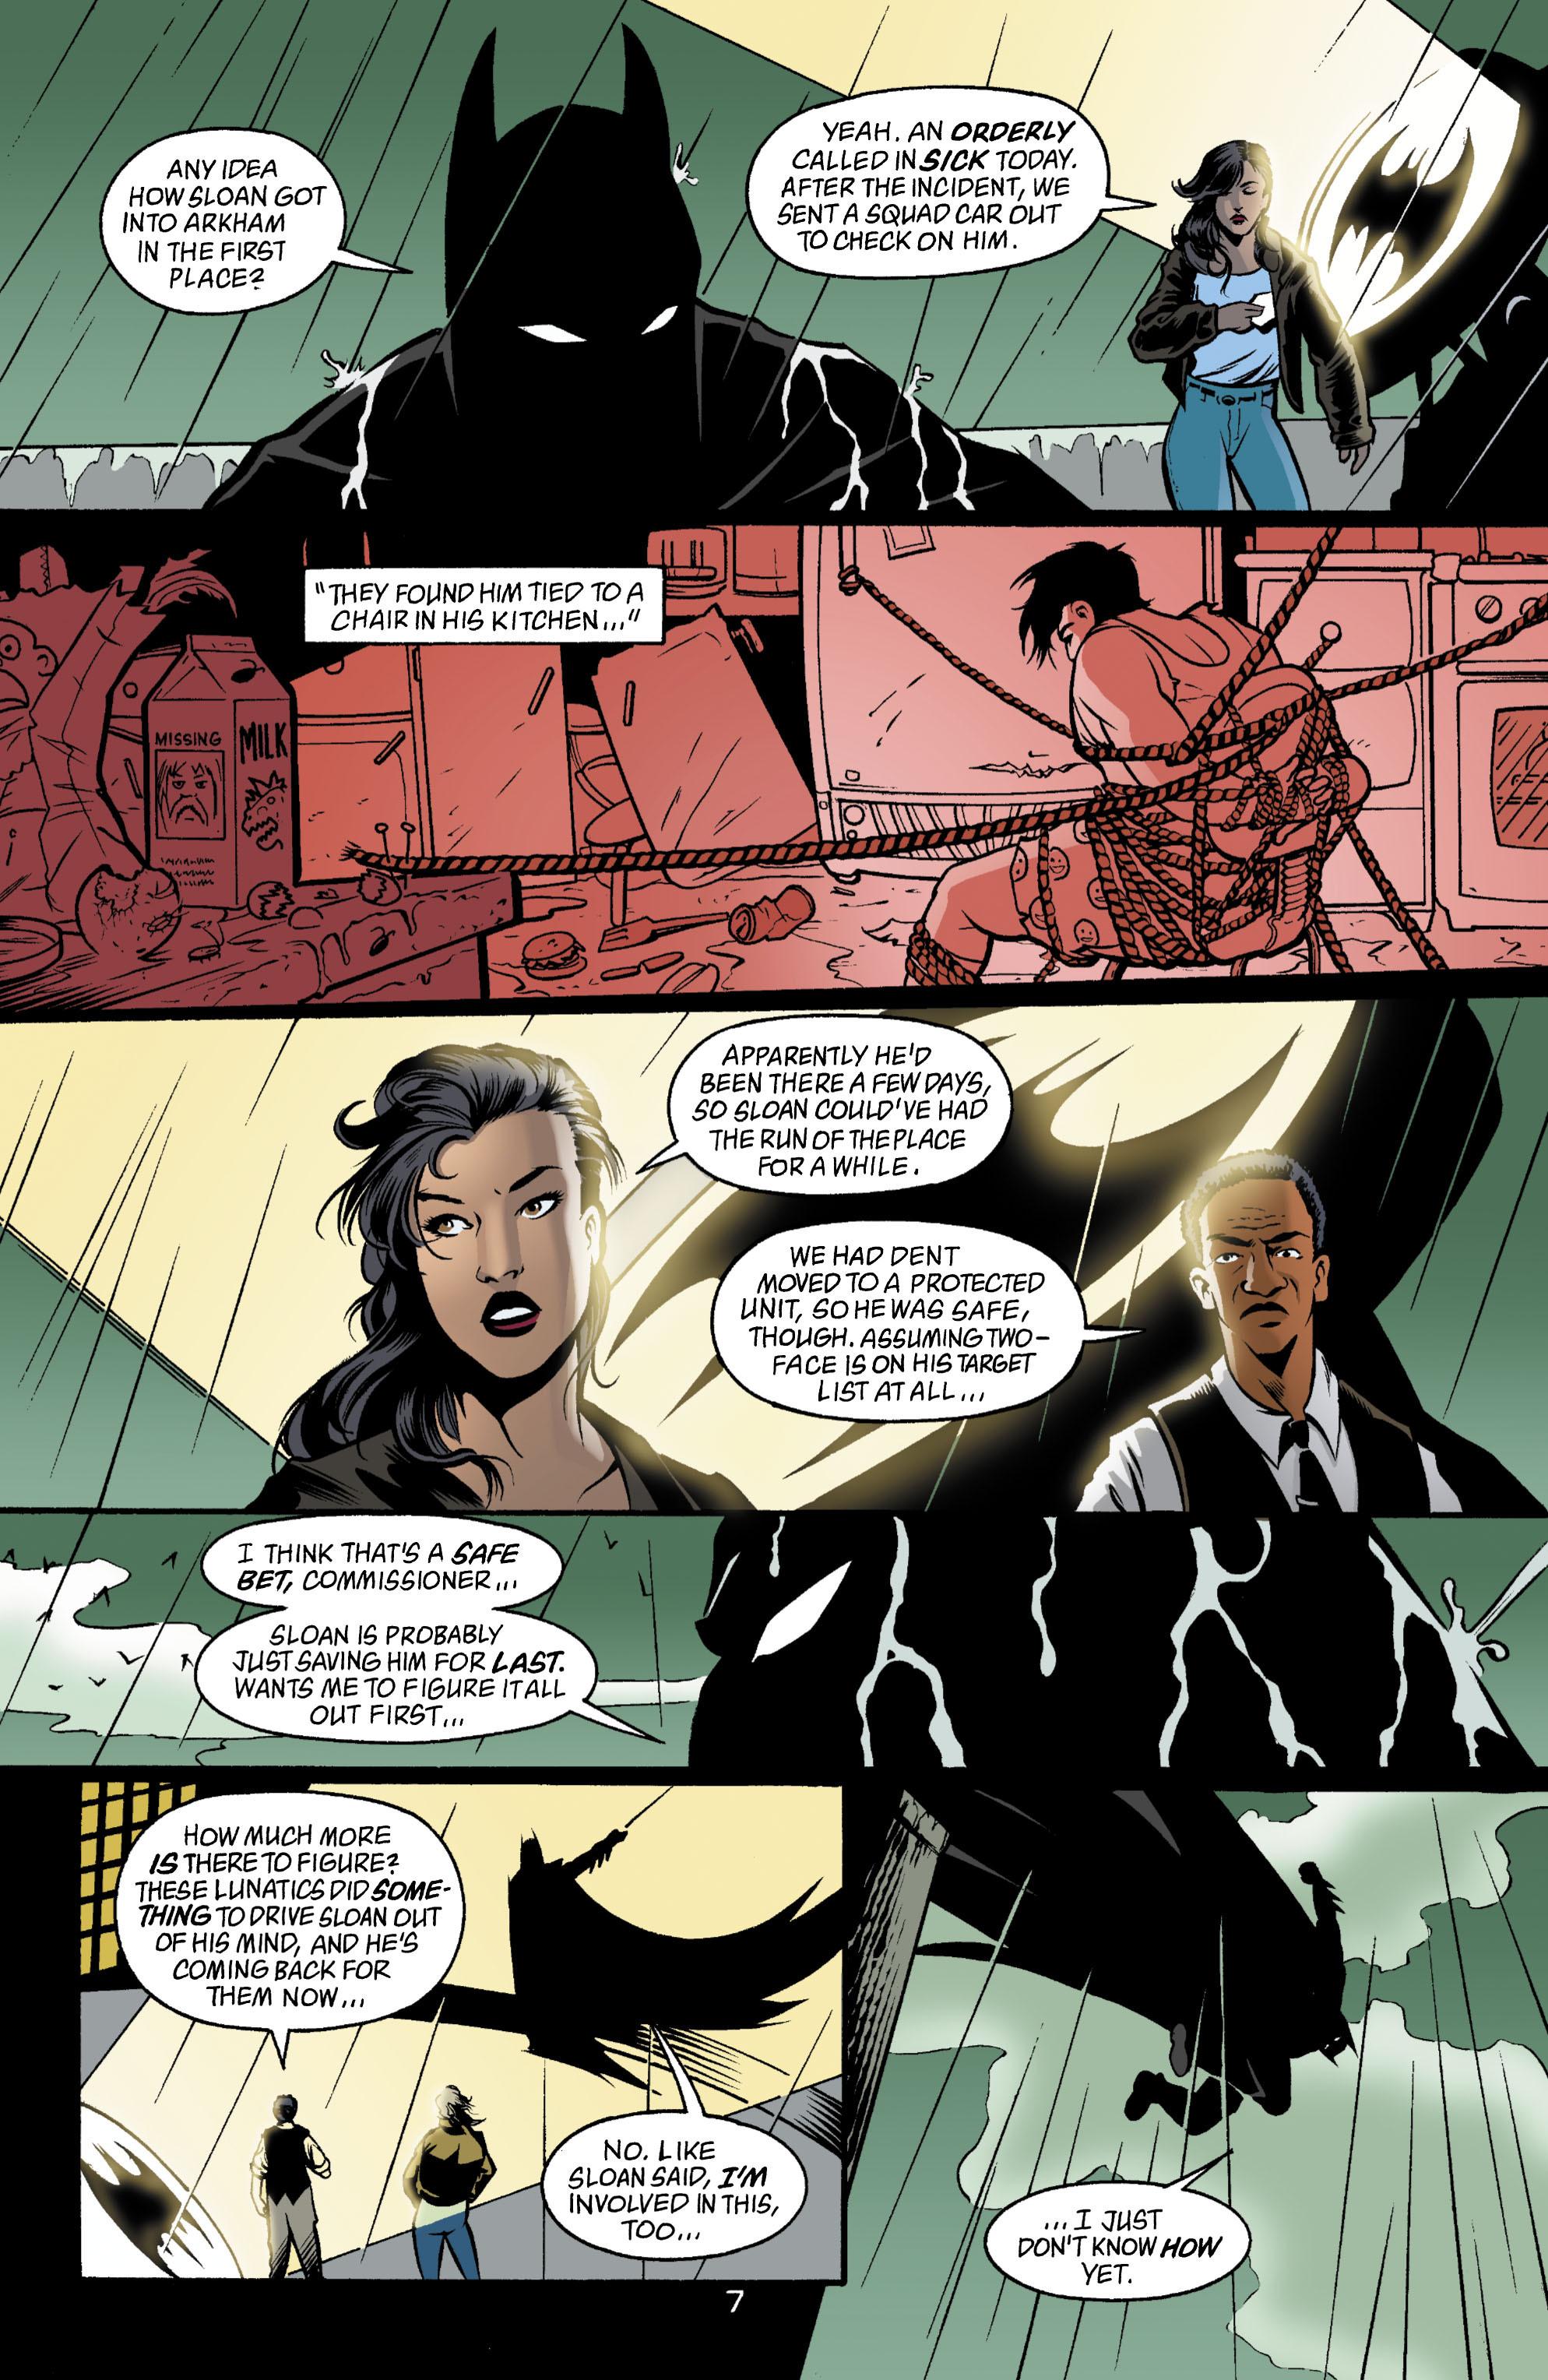 Detective Comics (1937) 780 Page 7